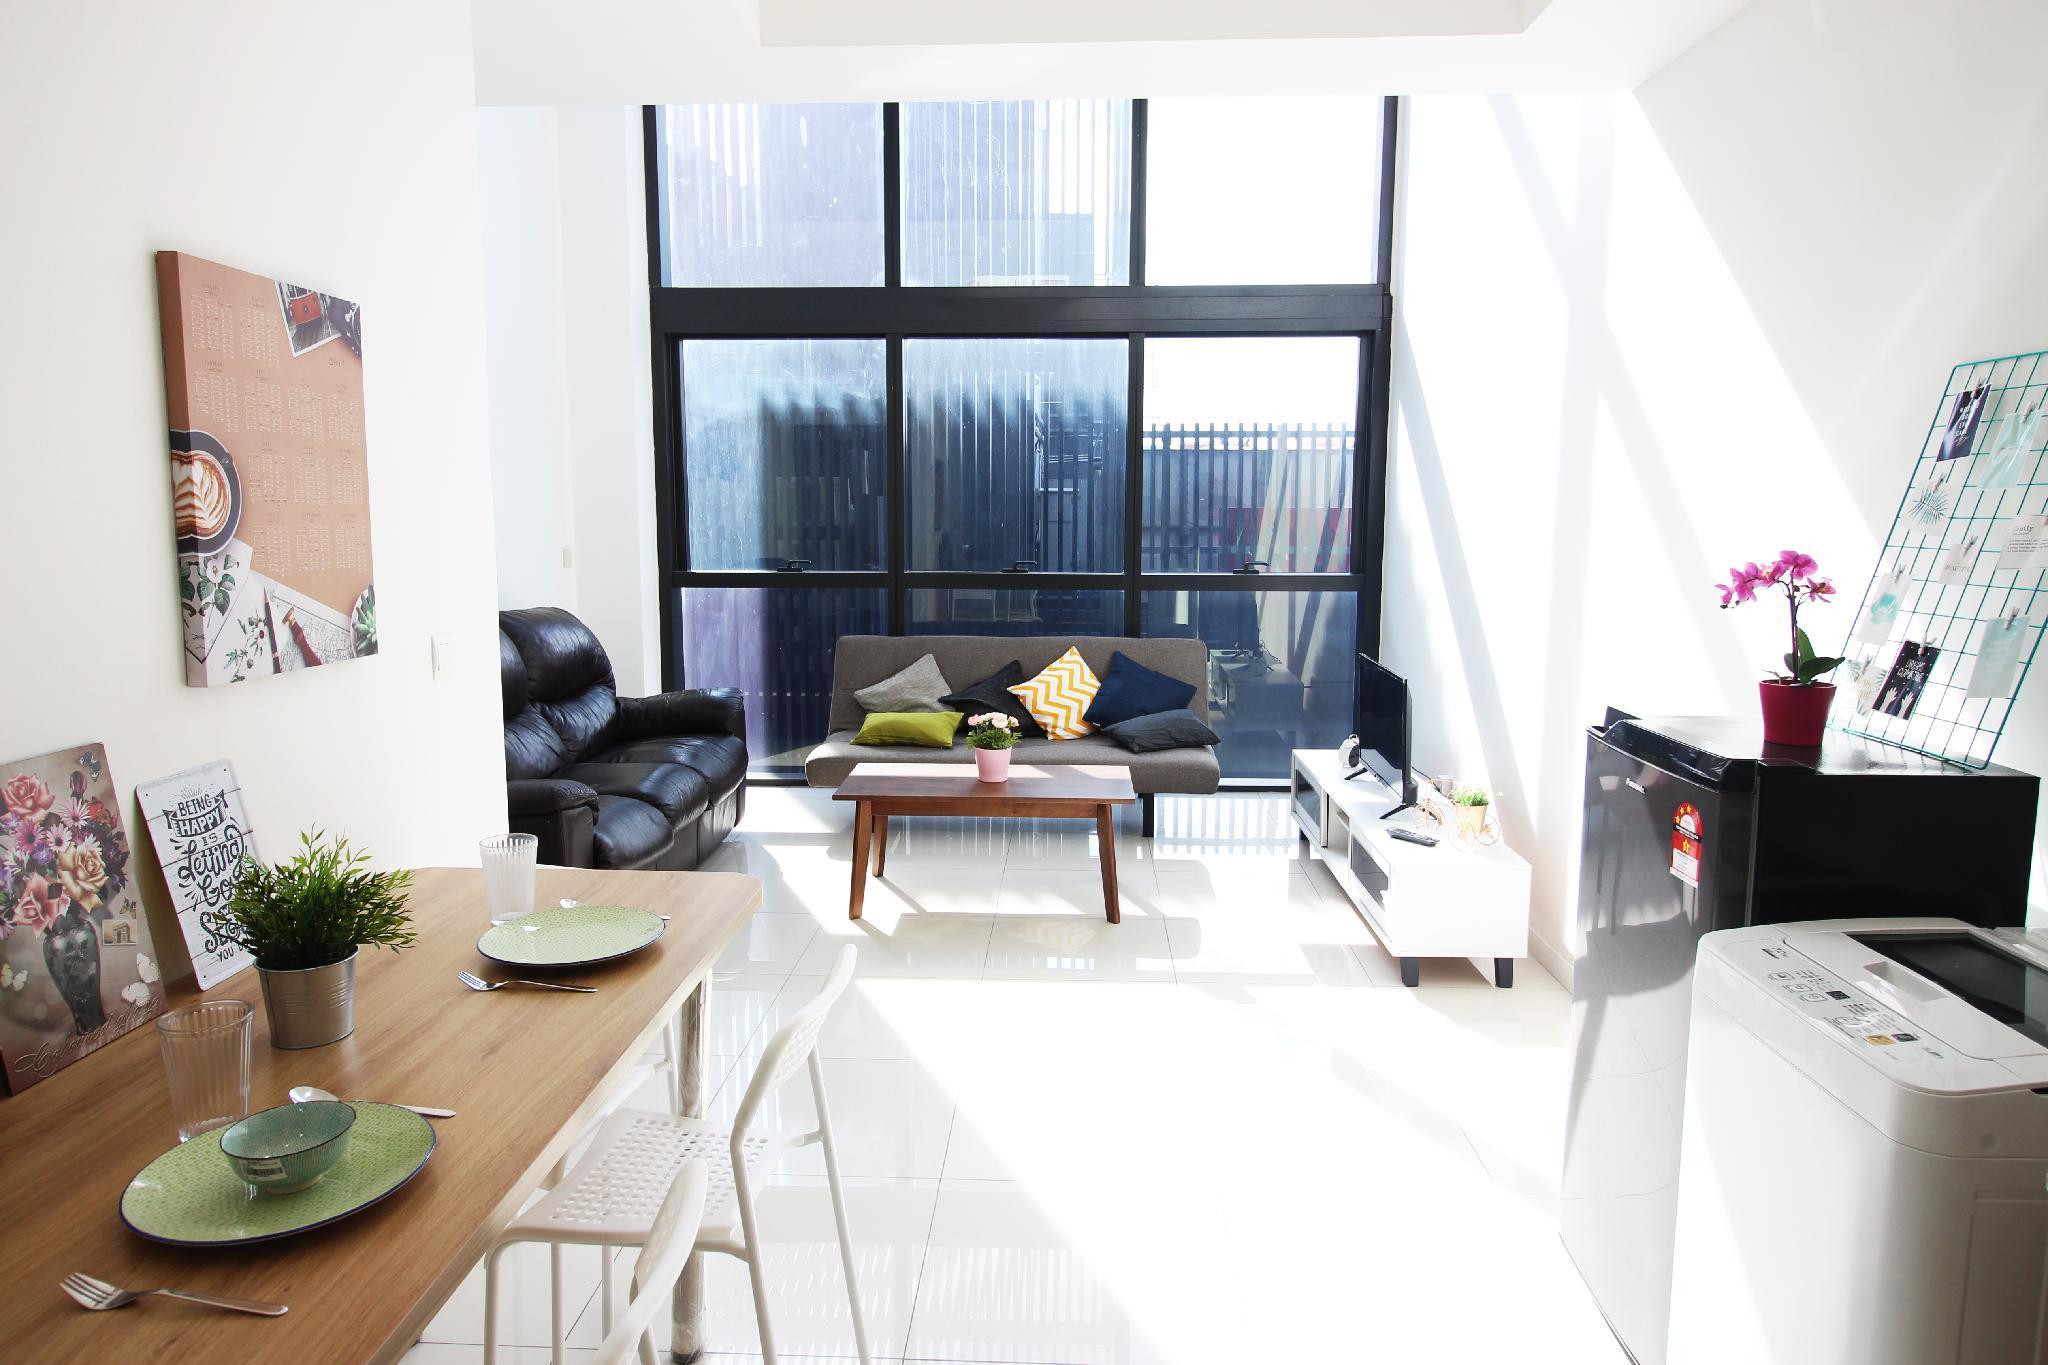 EIKON @ Sunway PJ Executive Studio Duplex